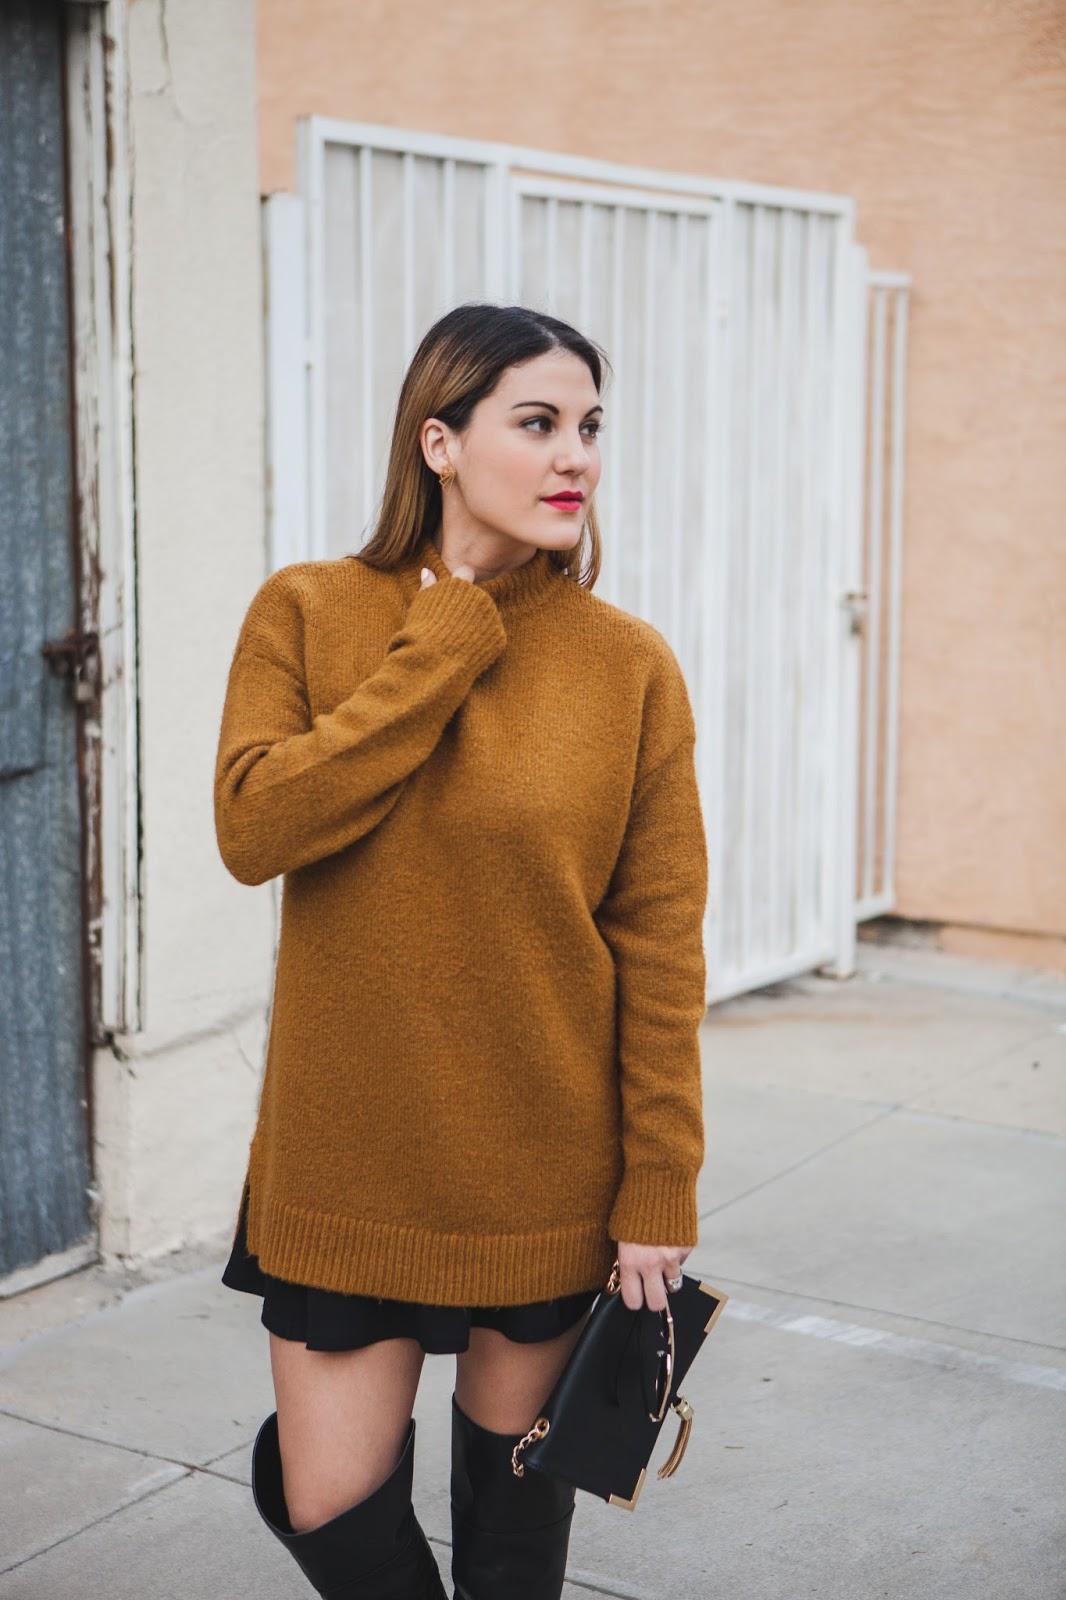 Style Blogger Taylor Winkelmeyer